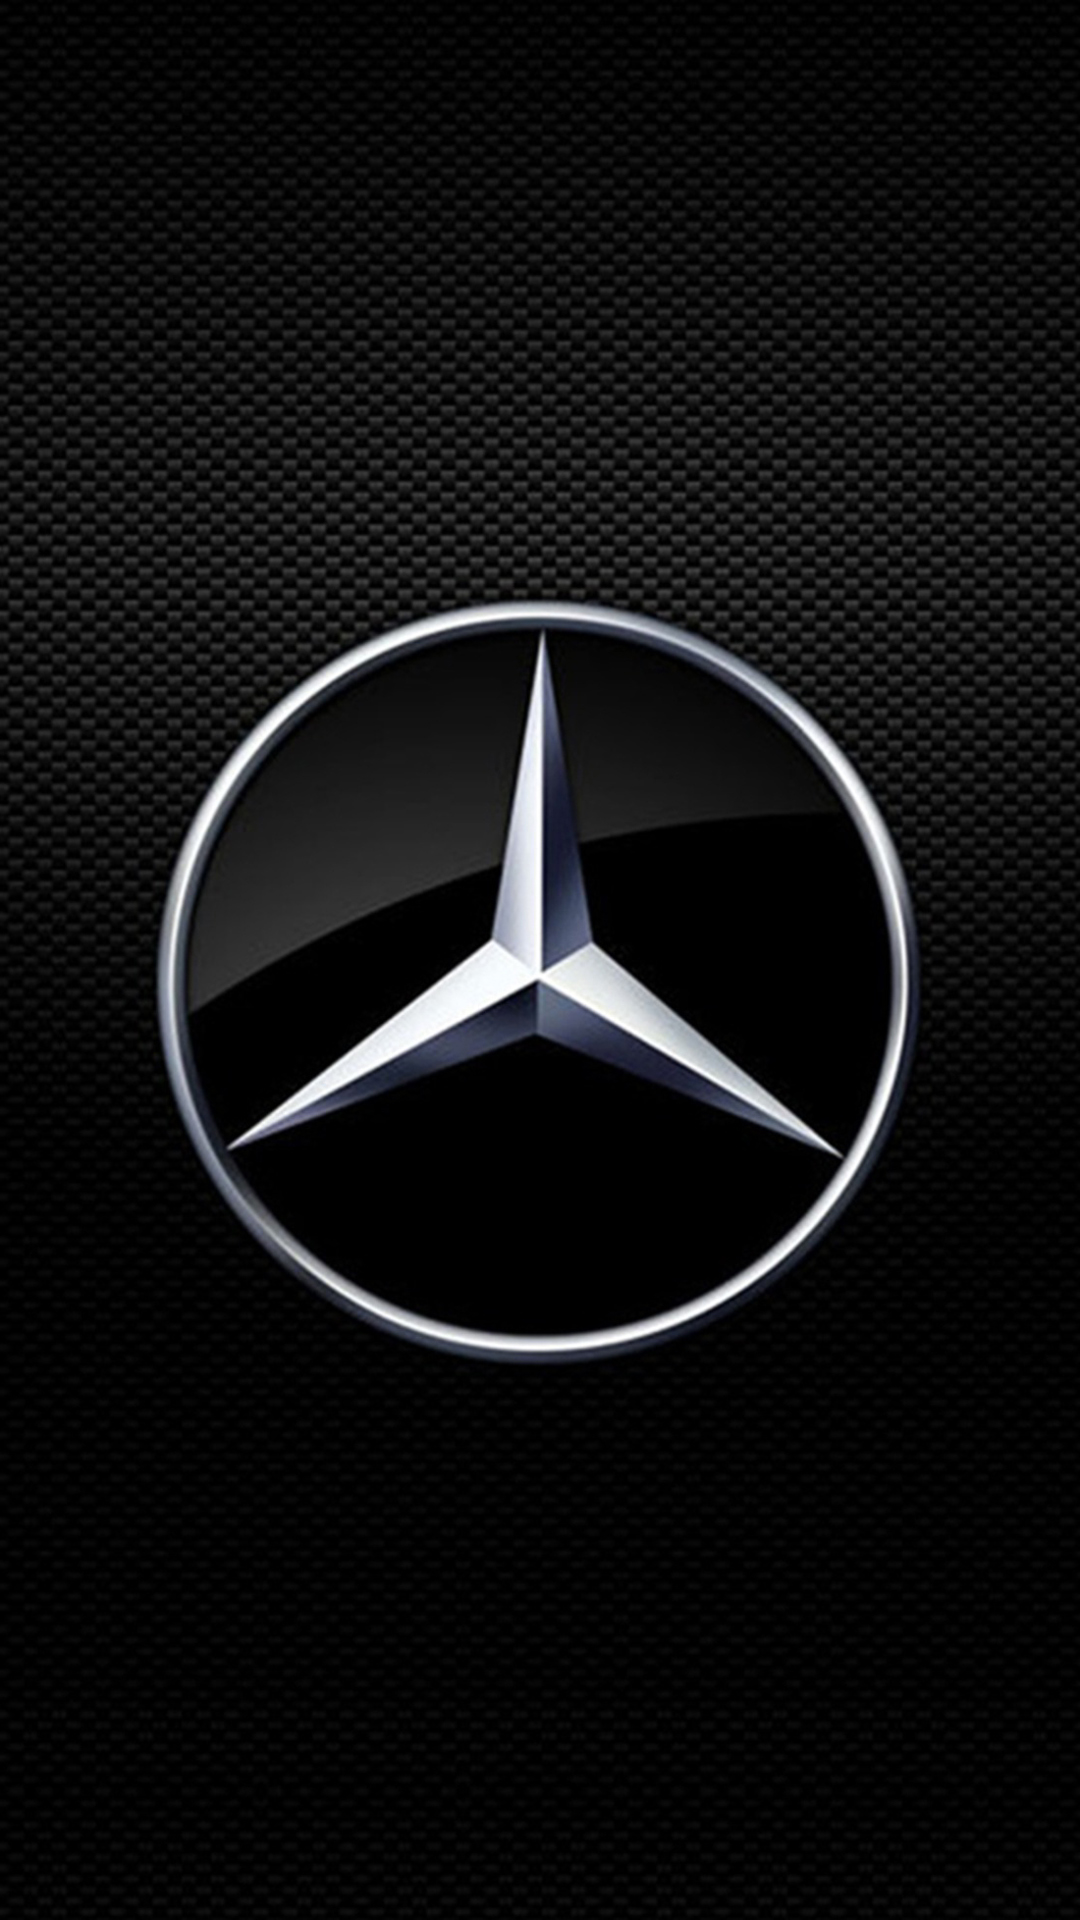 Mercedes Benz Logo 1080x1920